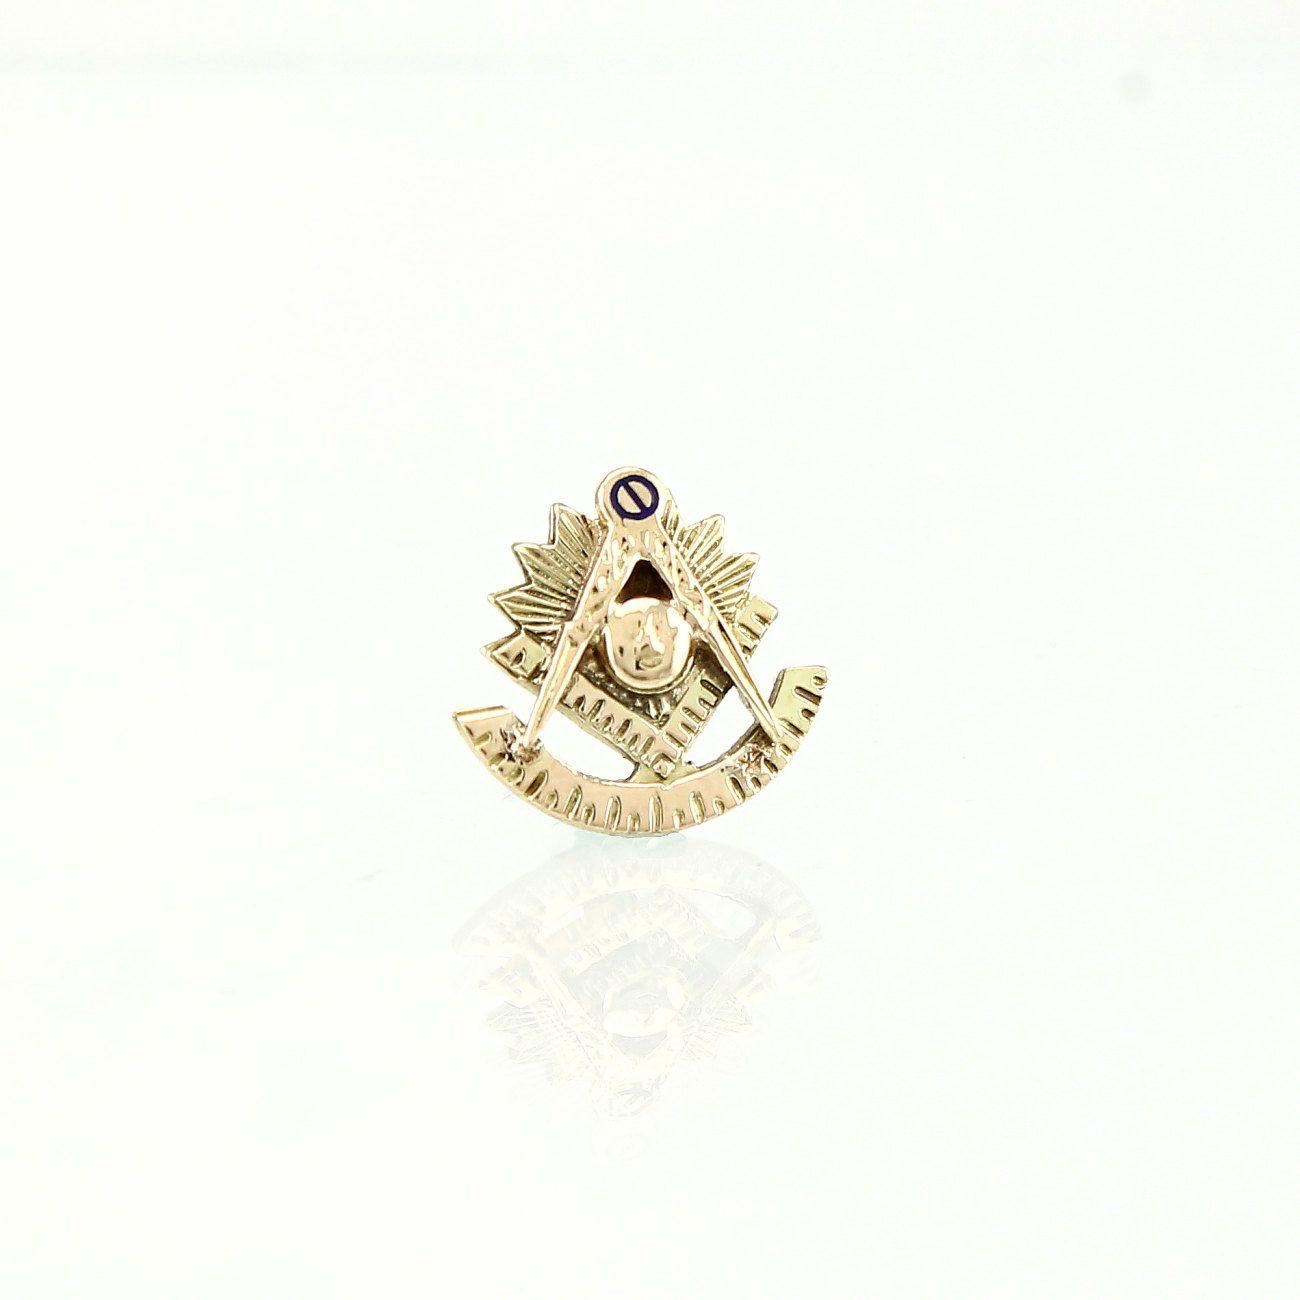 Past Master Lapel Pin 1-inch P05351 | eBay